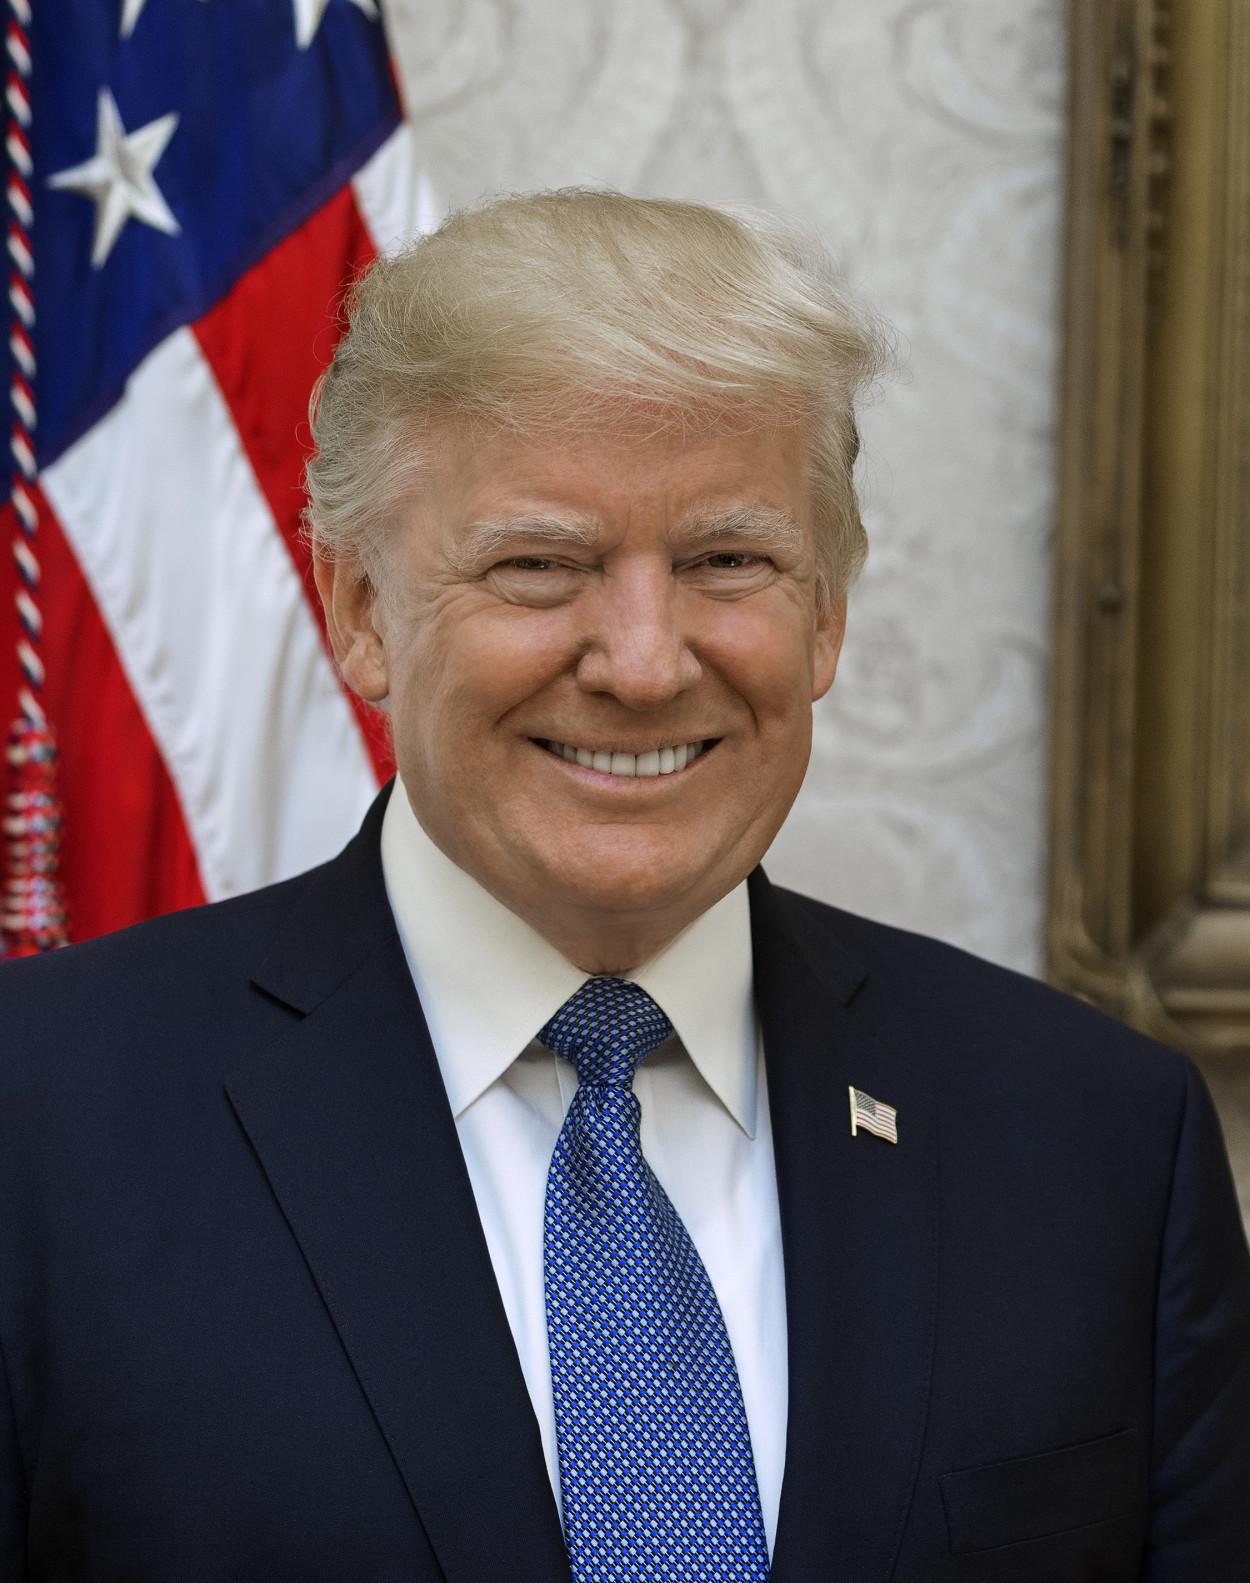 .Donald Trump